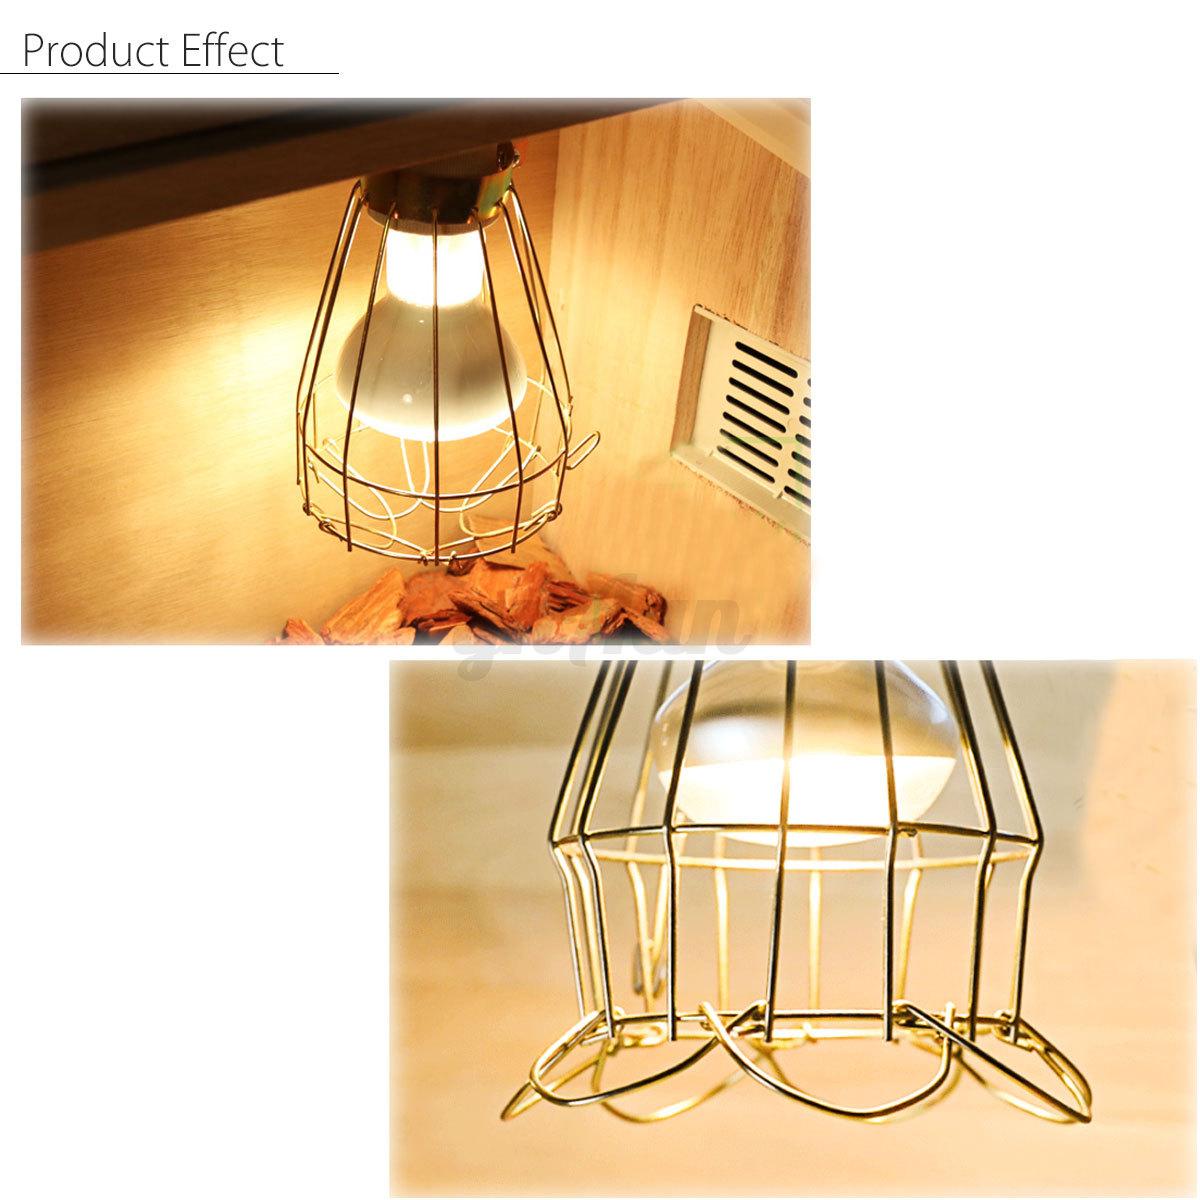 Reptile Heat Lamp Shade Cover Anti Scald Heating Light